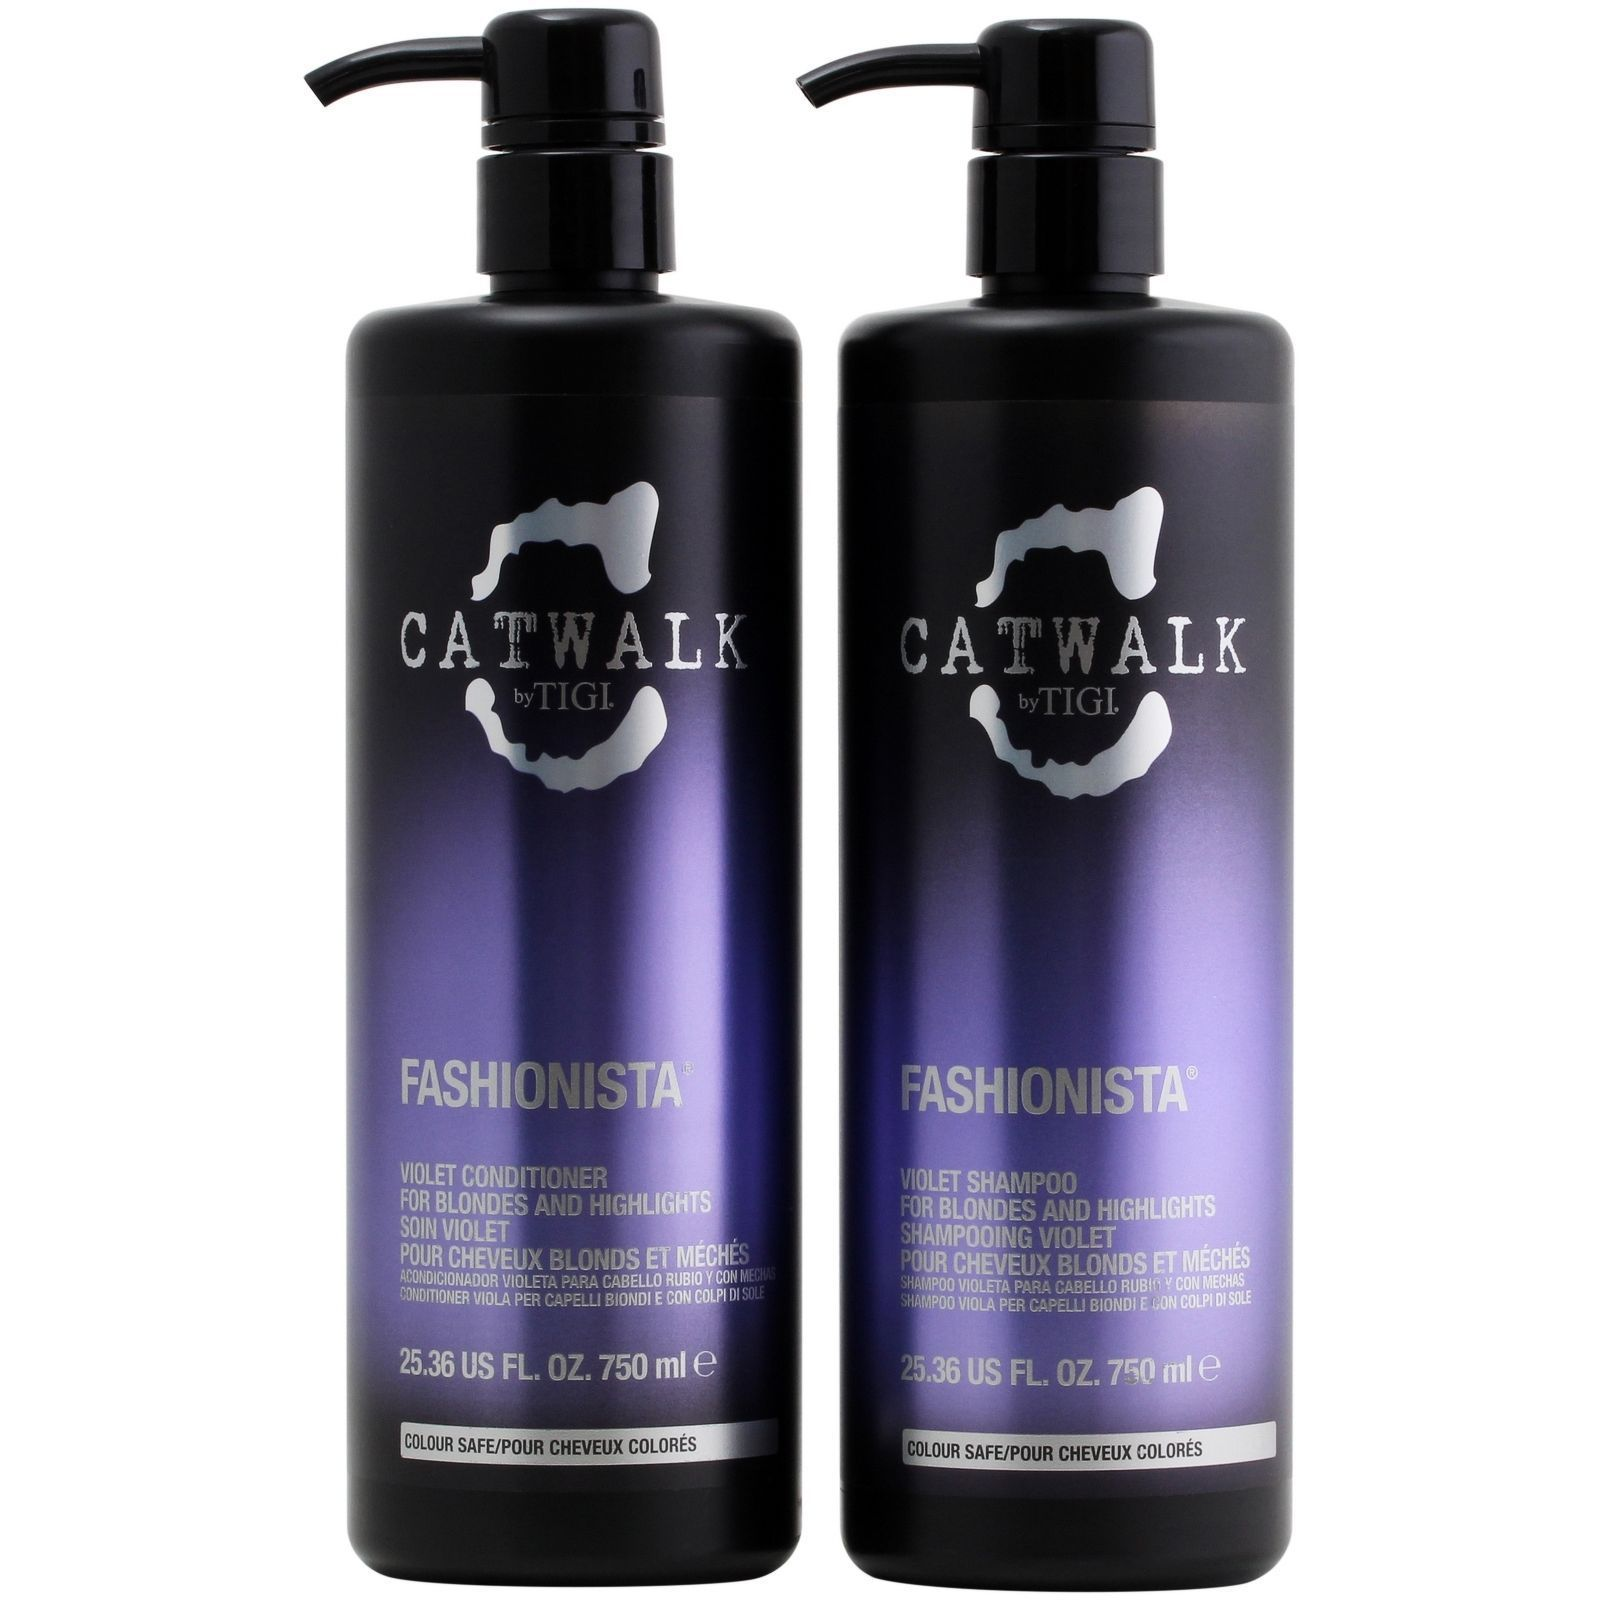 Shop Tigi Catwalk Fashionista Violet Shampoo And Conditioner Set